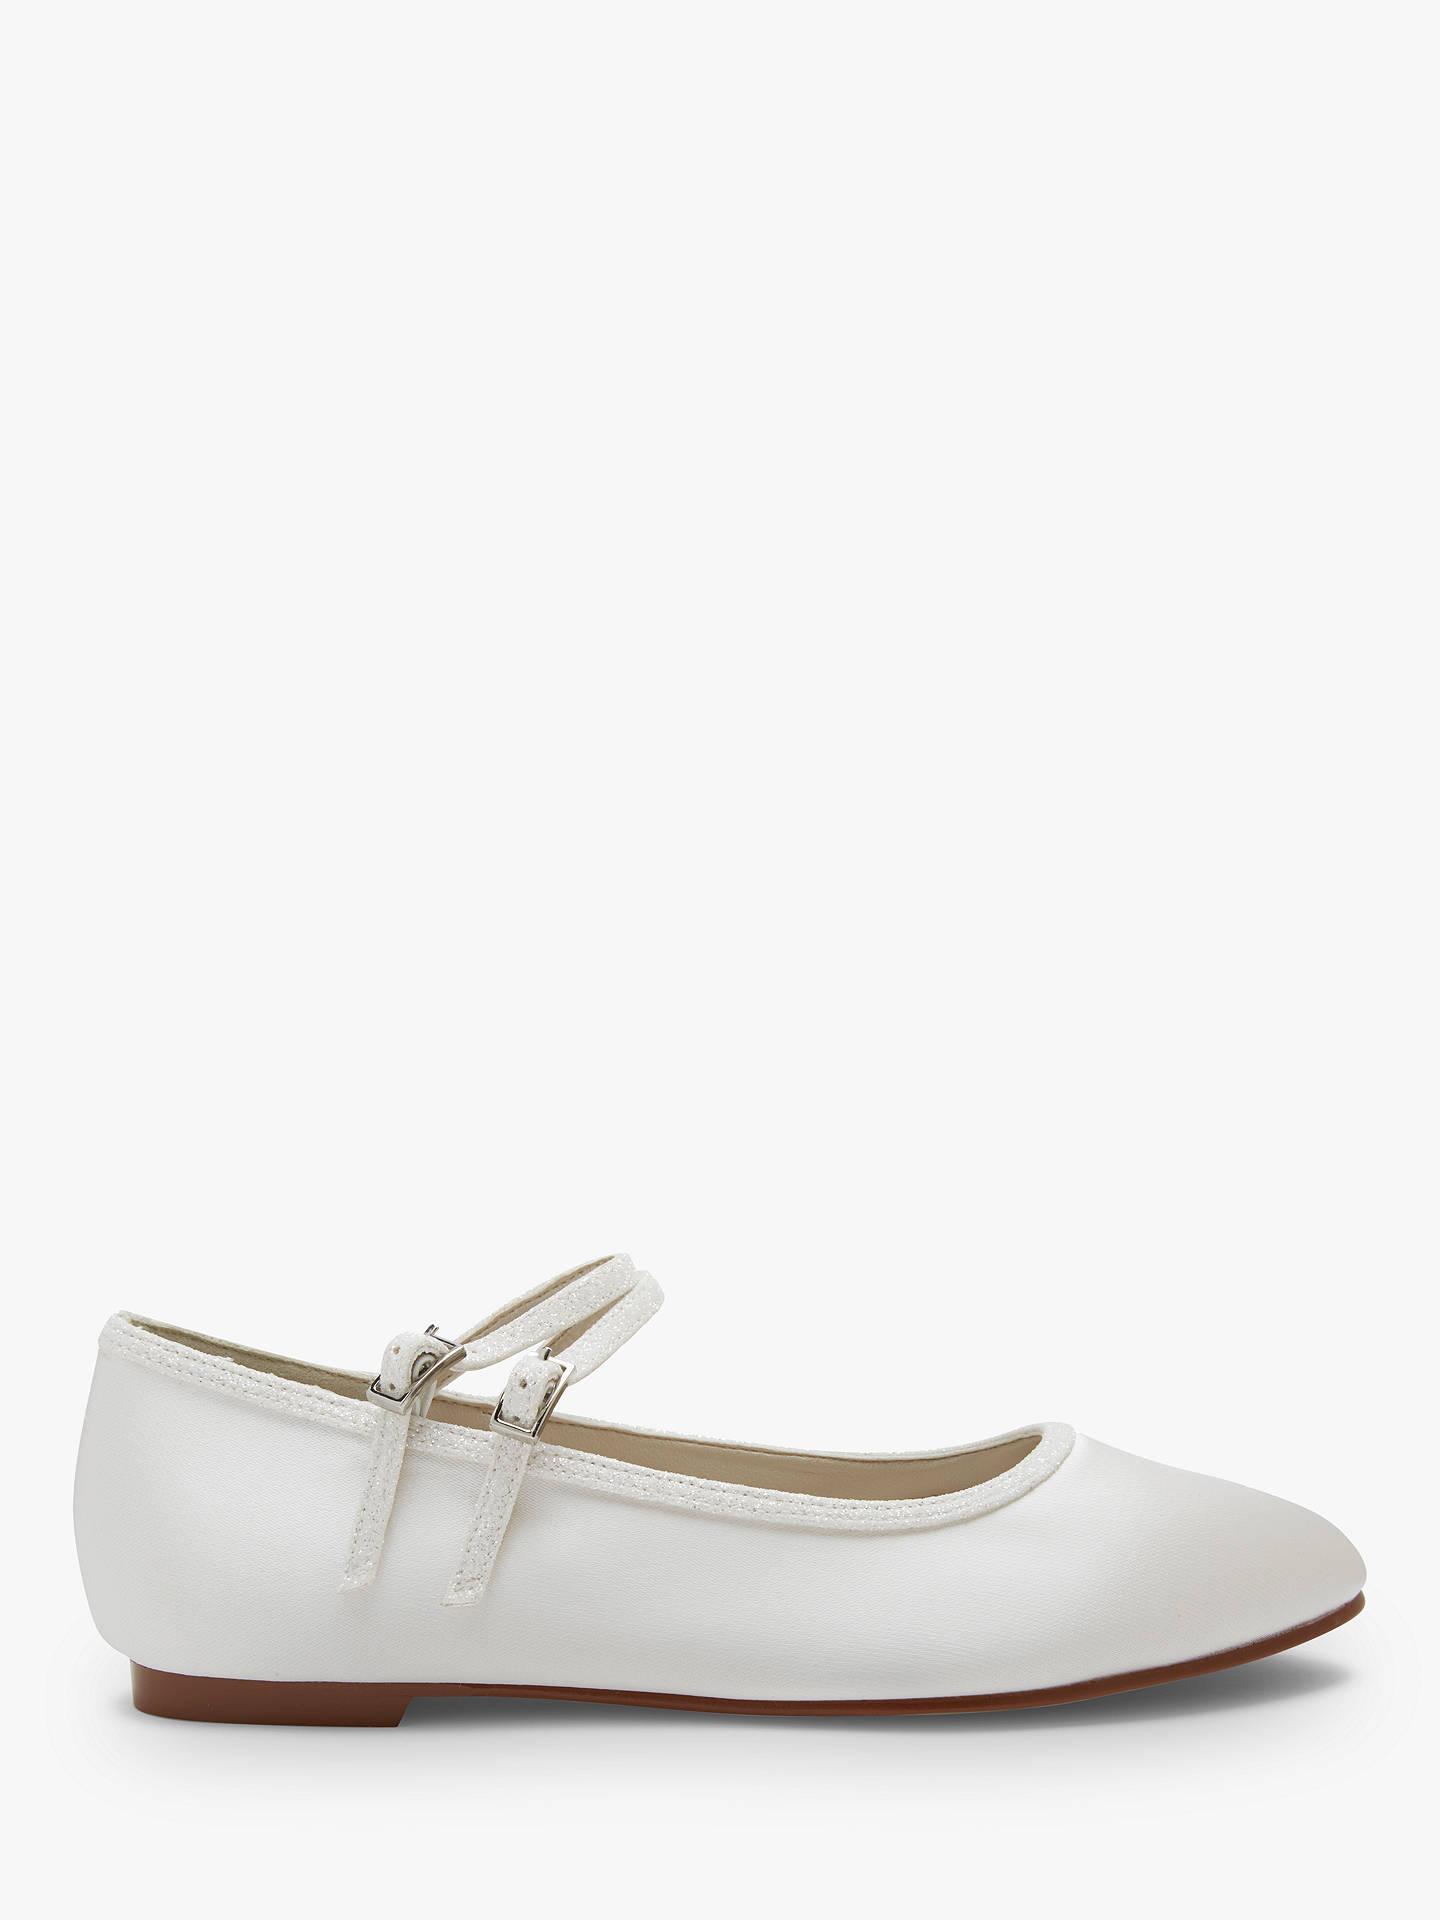 4e7721742d Rainbow Club Maddison Bridesmaids' Shoes, Ivory